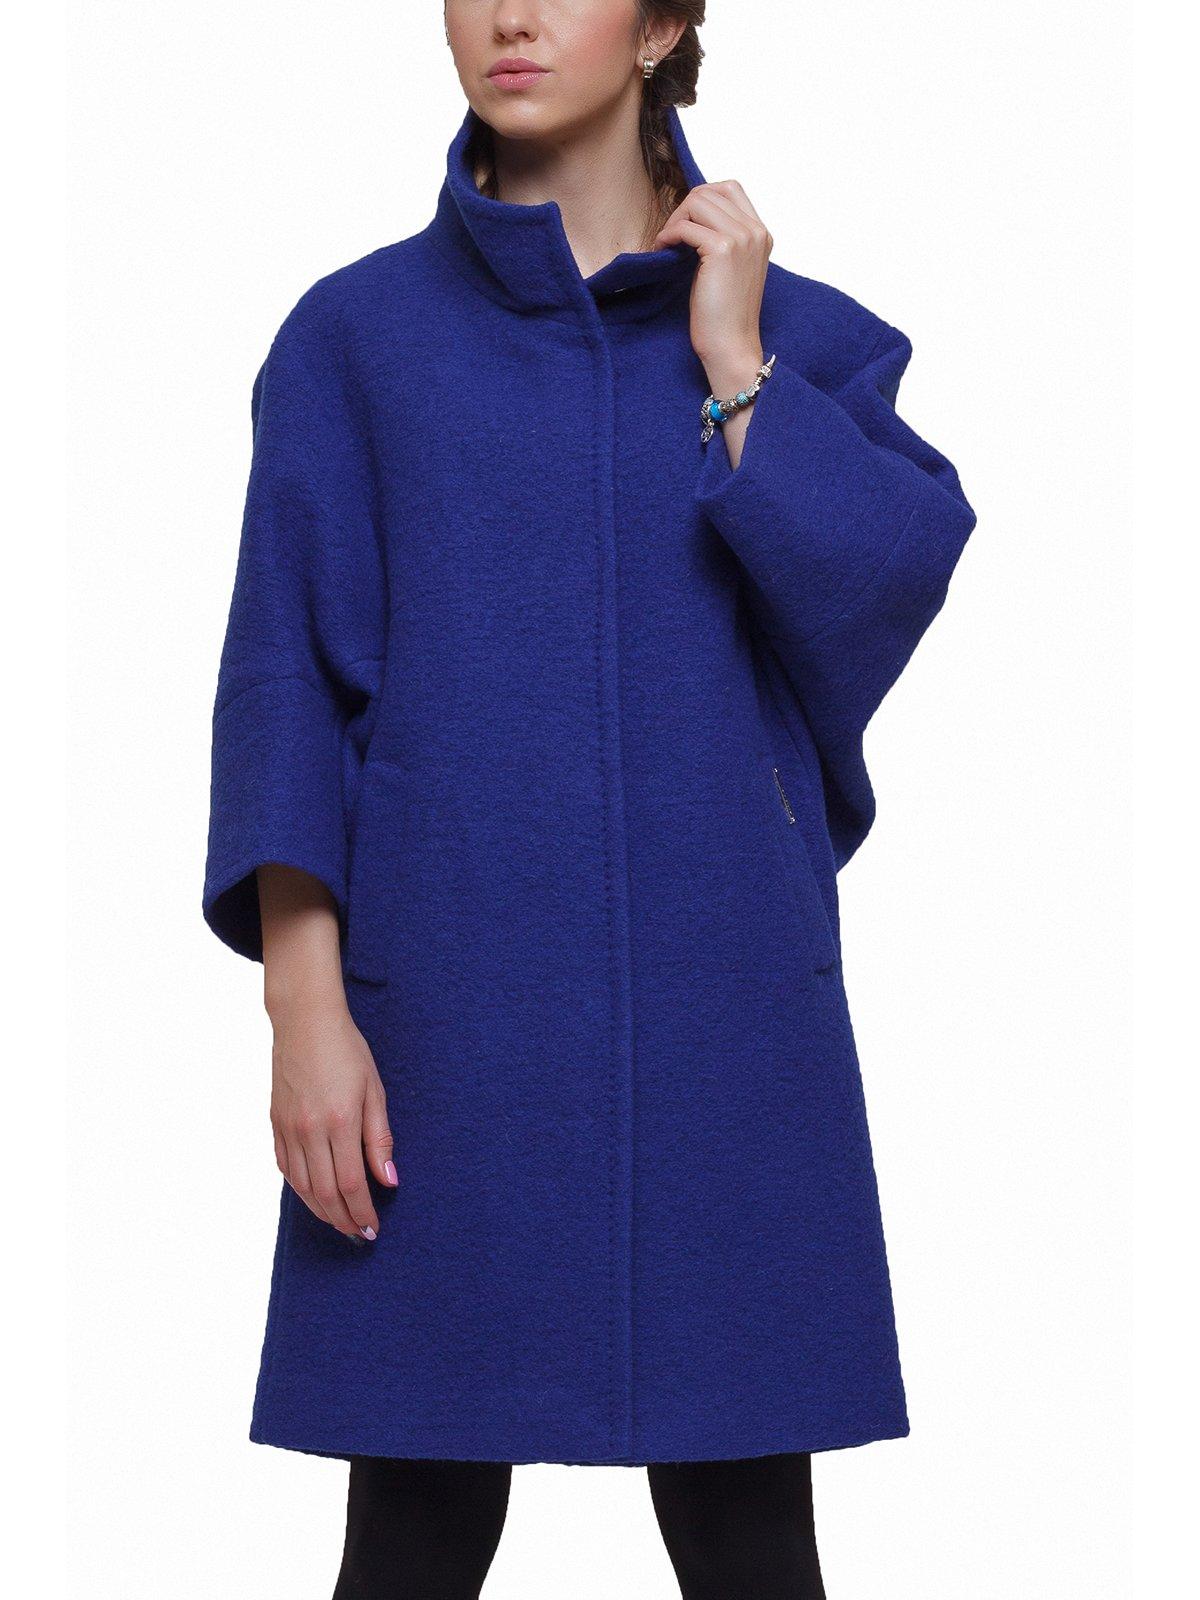 Пальто синее | 2689634 | фото 2